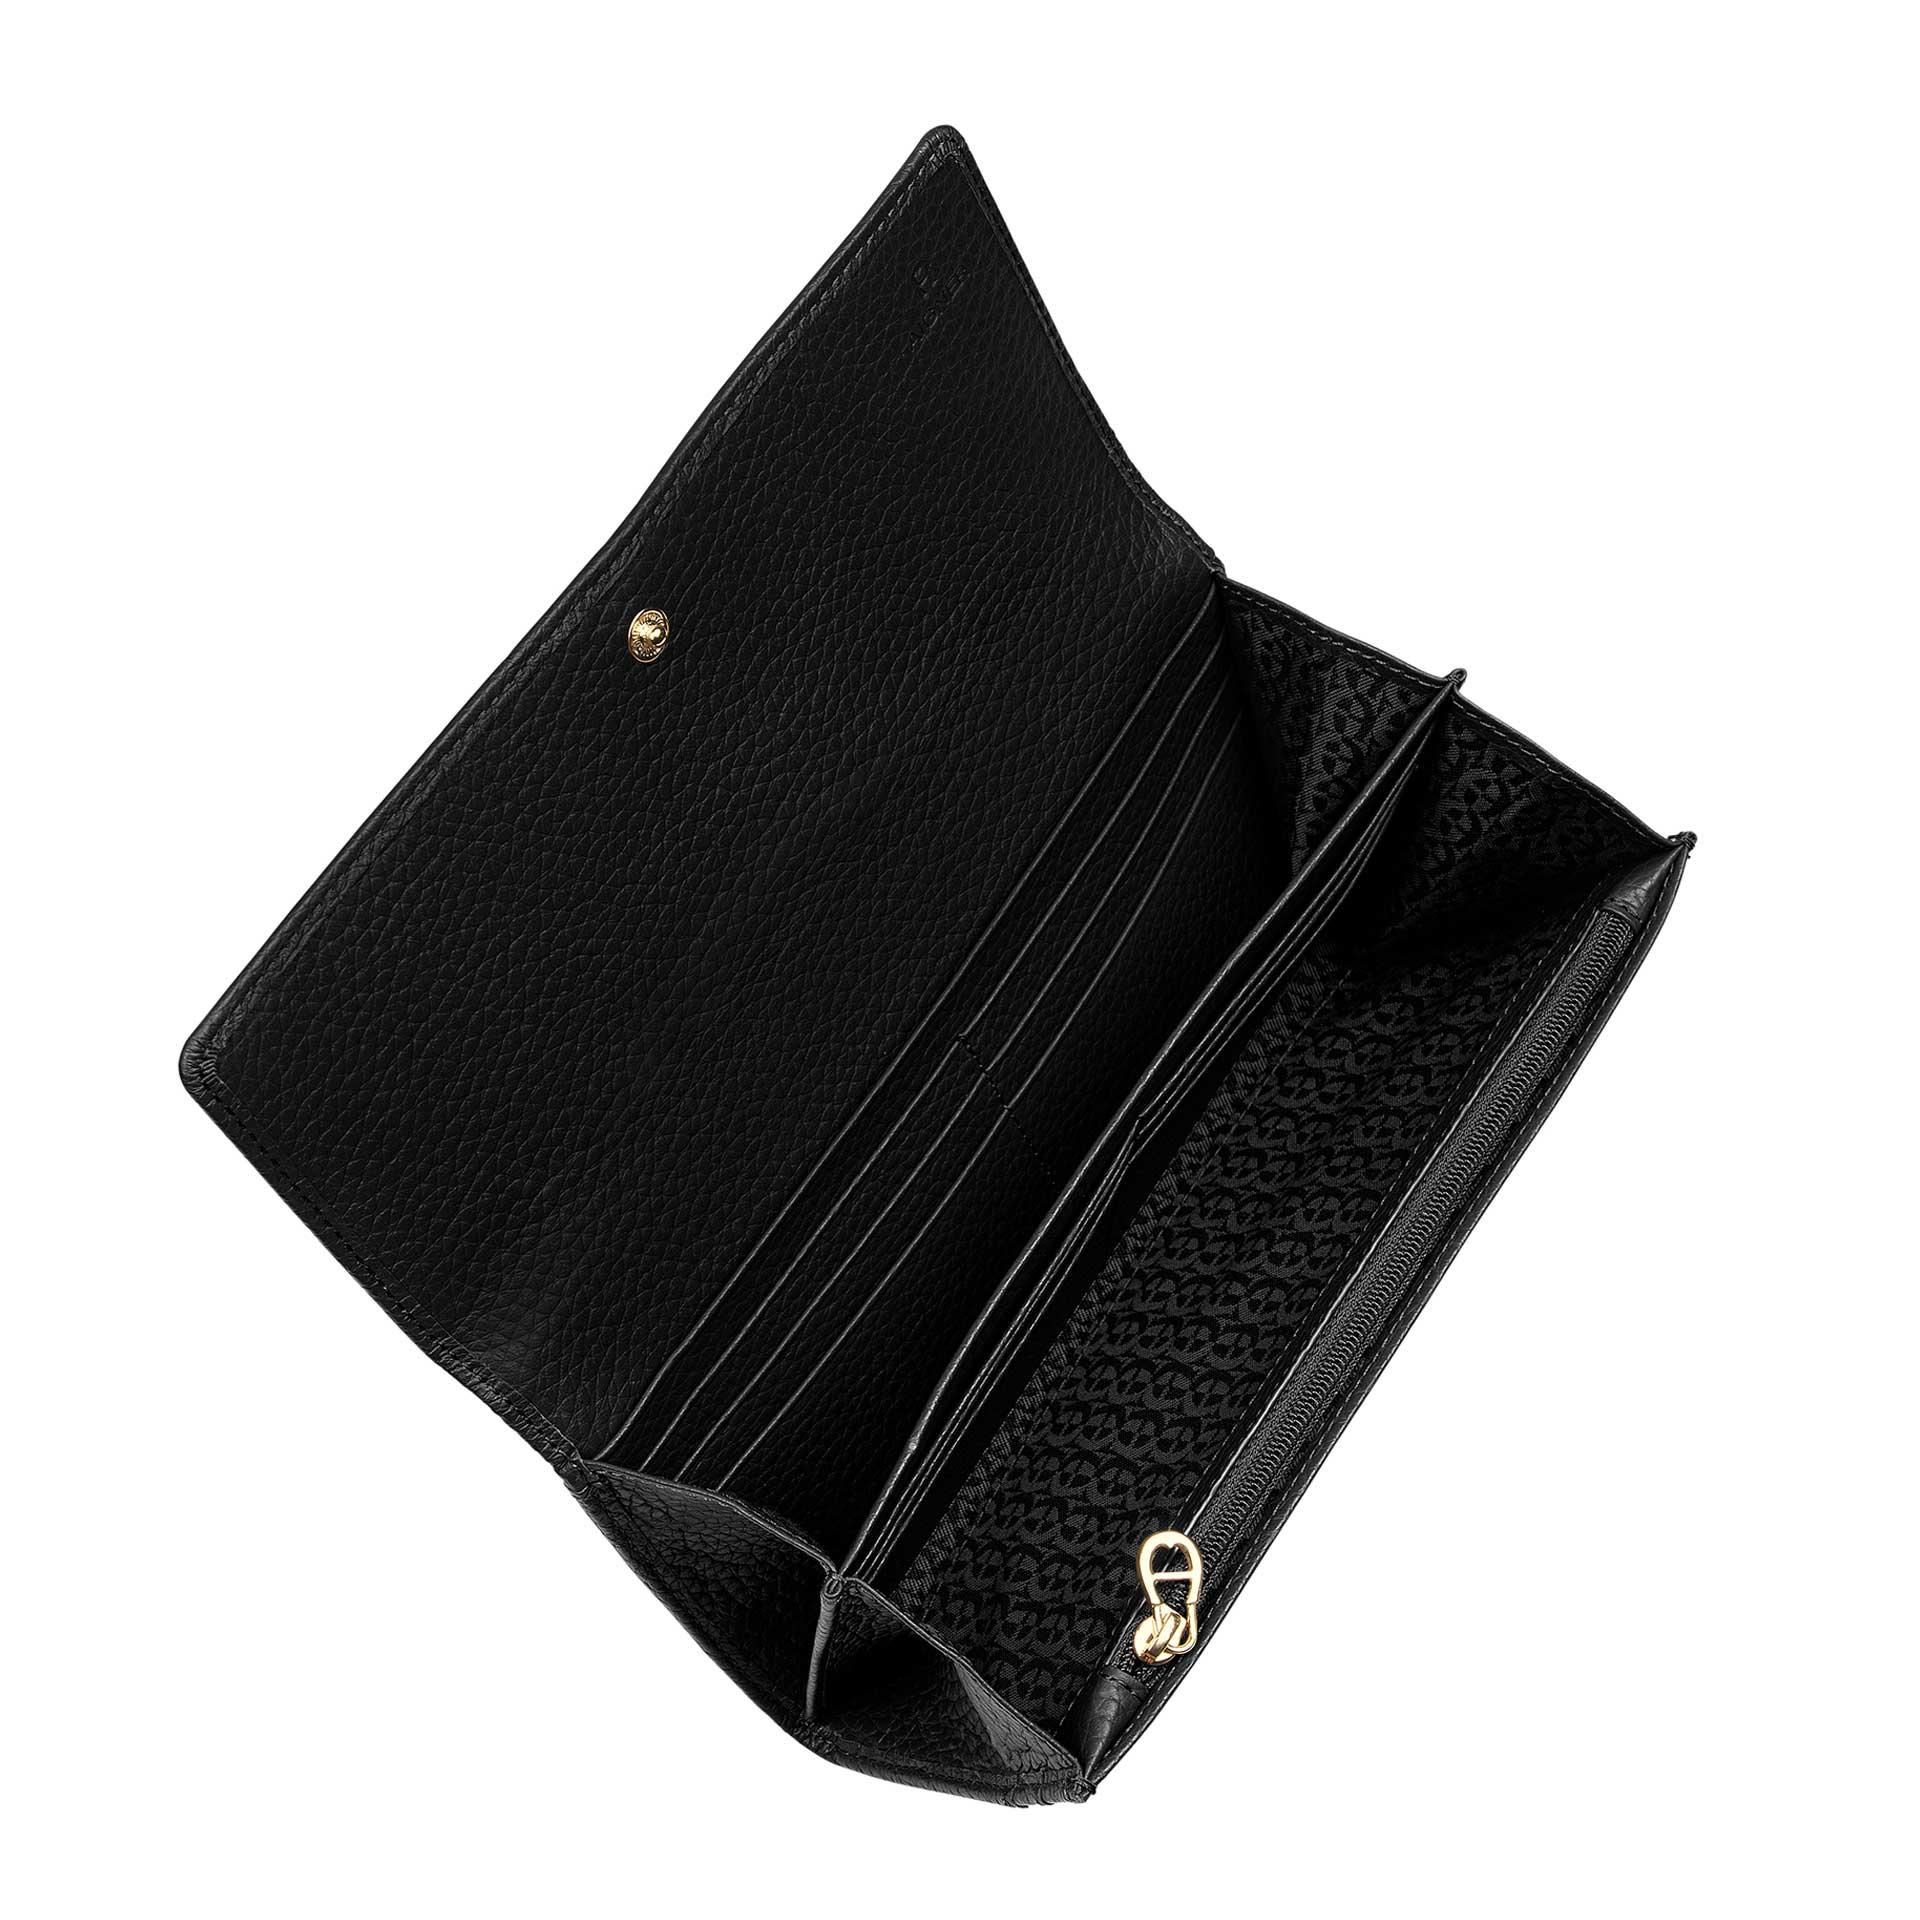 Aigner Fashion Portemonnaie black